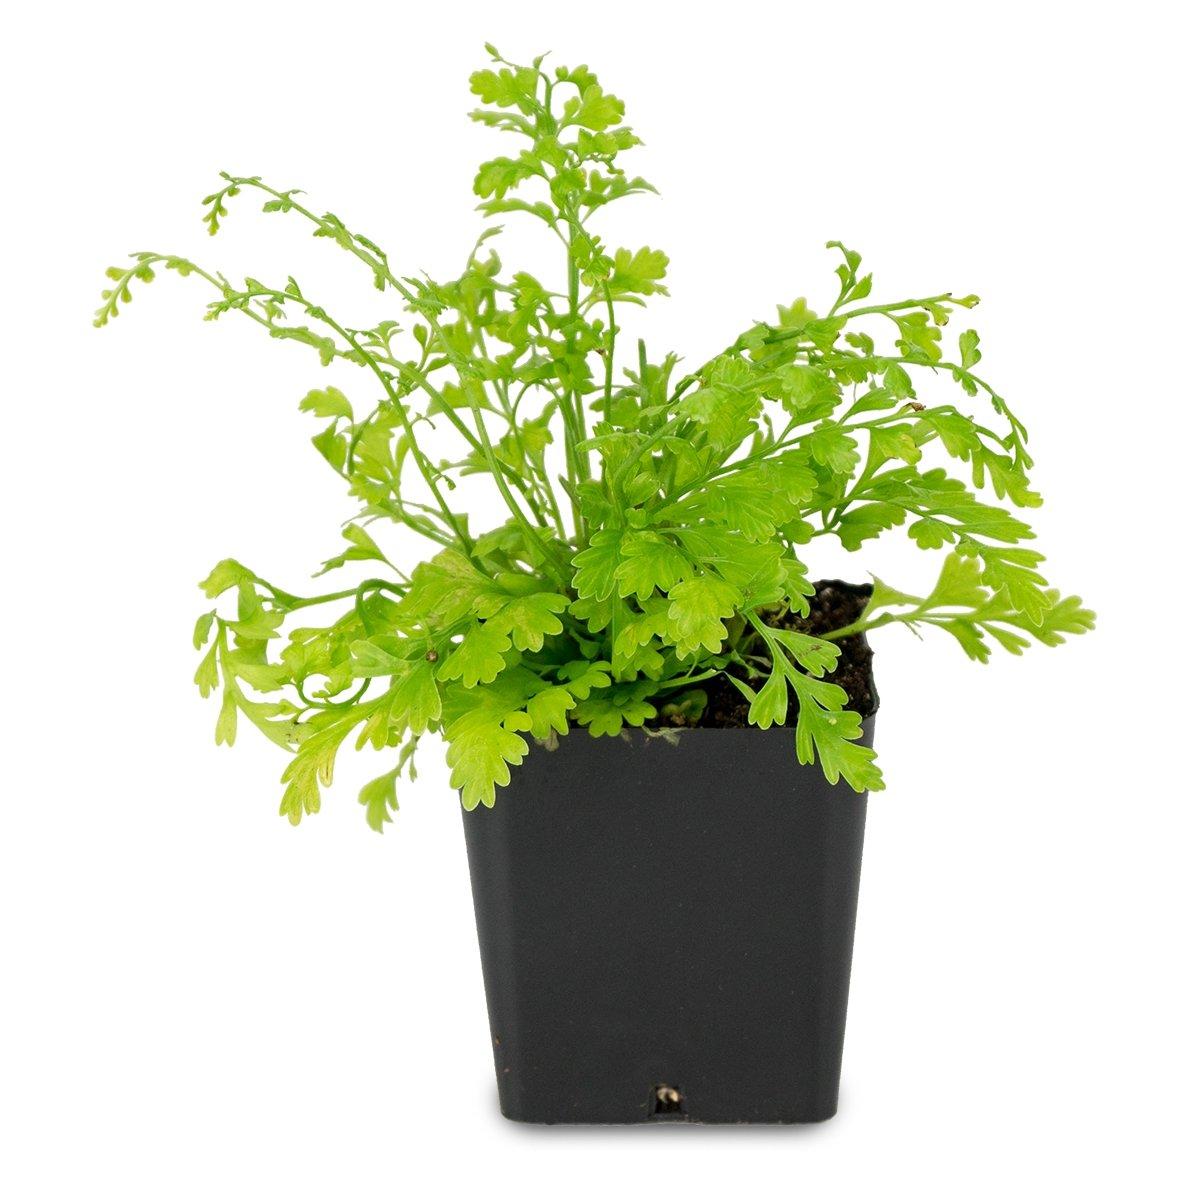 "Picture of Live Mother Fern aka Asplenium bulbiferum Plant Fit 4"" Pot"